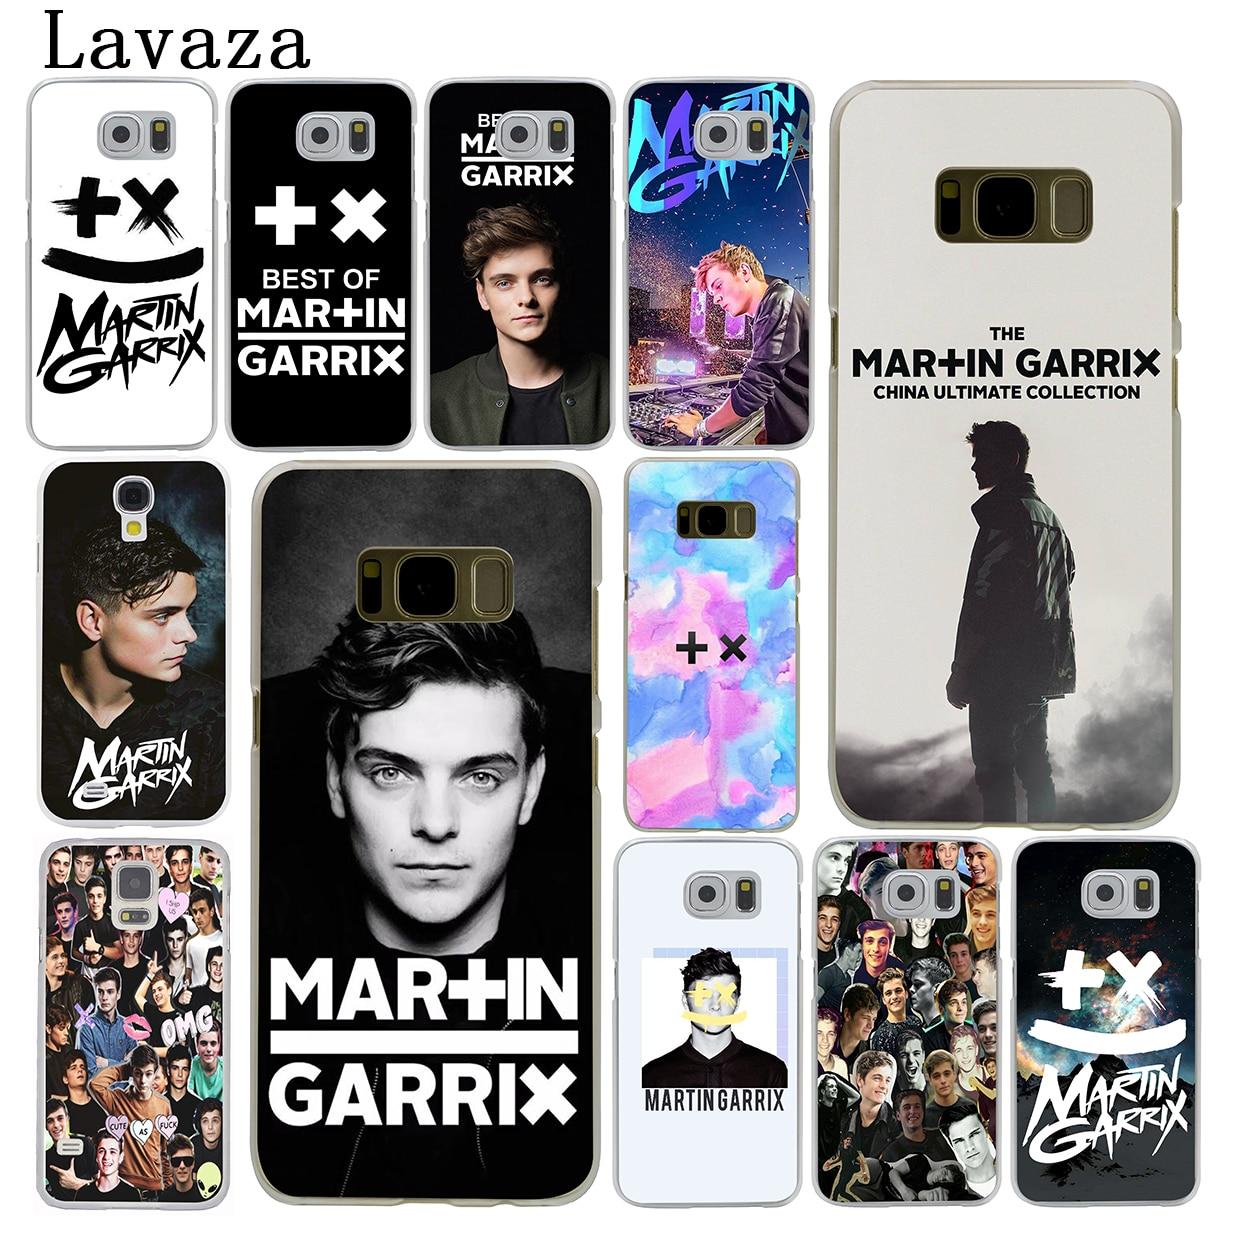 Lavaza Martin Garrix Famous DJ Hard Phone Cover Case for Samsung Galaxy S9 S6 S7 Edge S8 Plus S3 S4 S5 & Mini S2 Cases